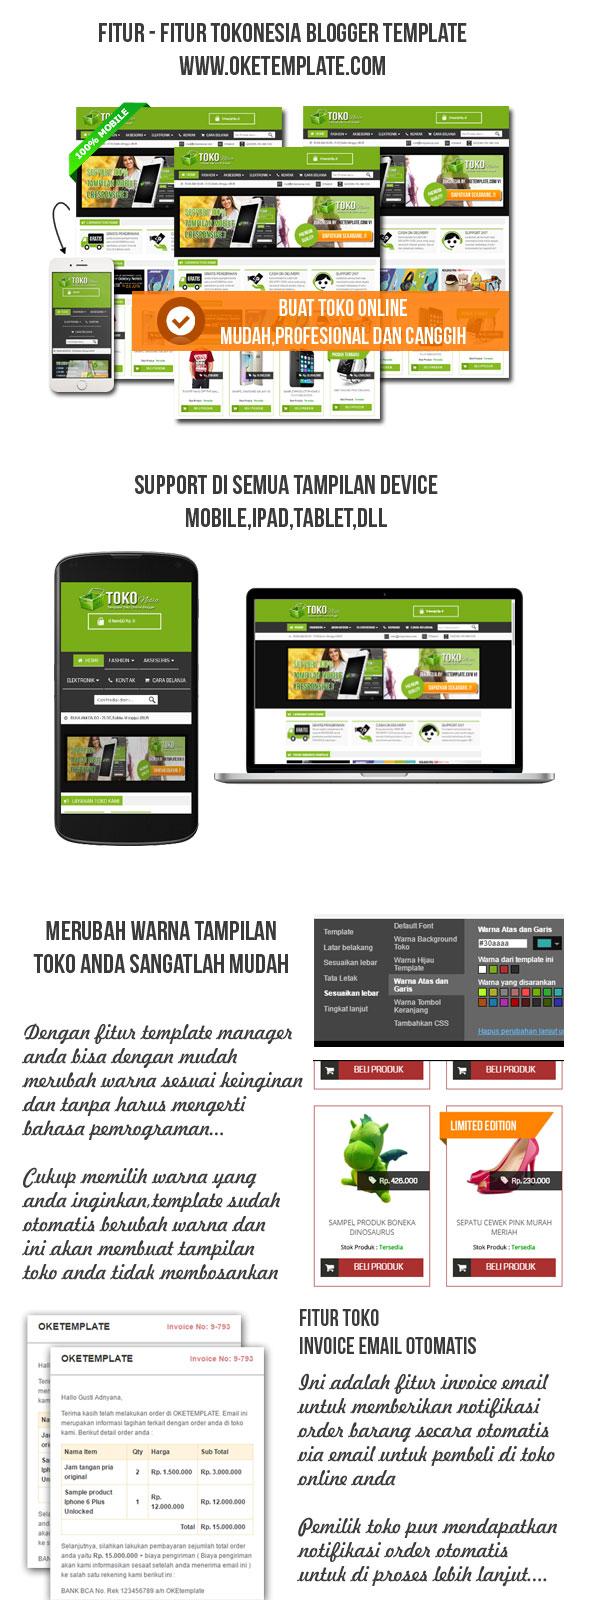 template toko online blogspot responsive tokonesia, Invoice examples